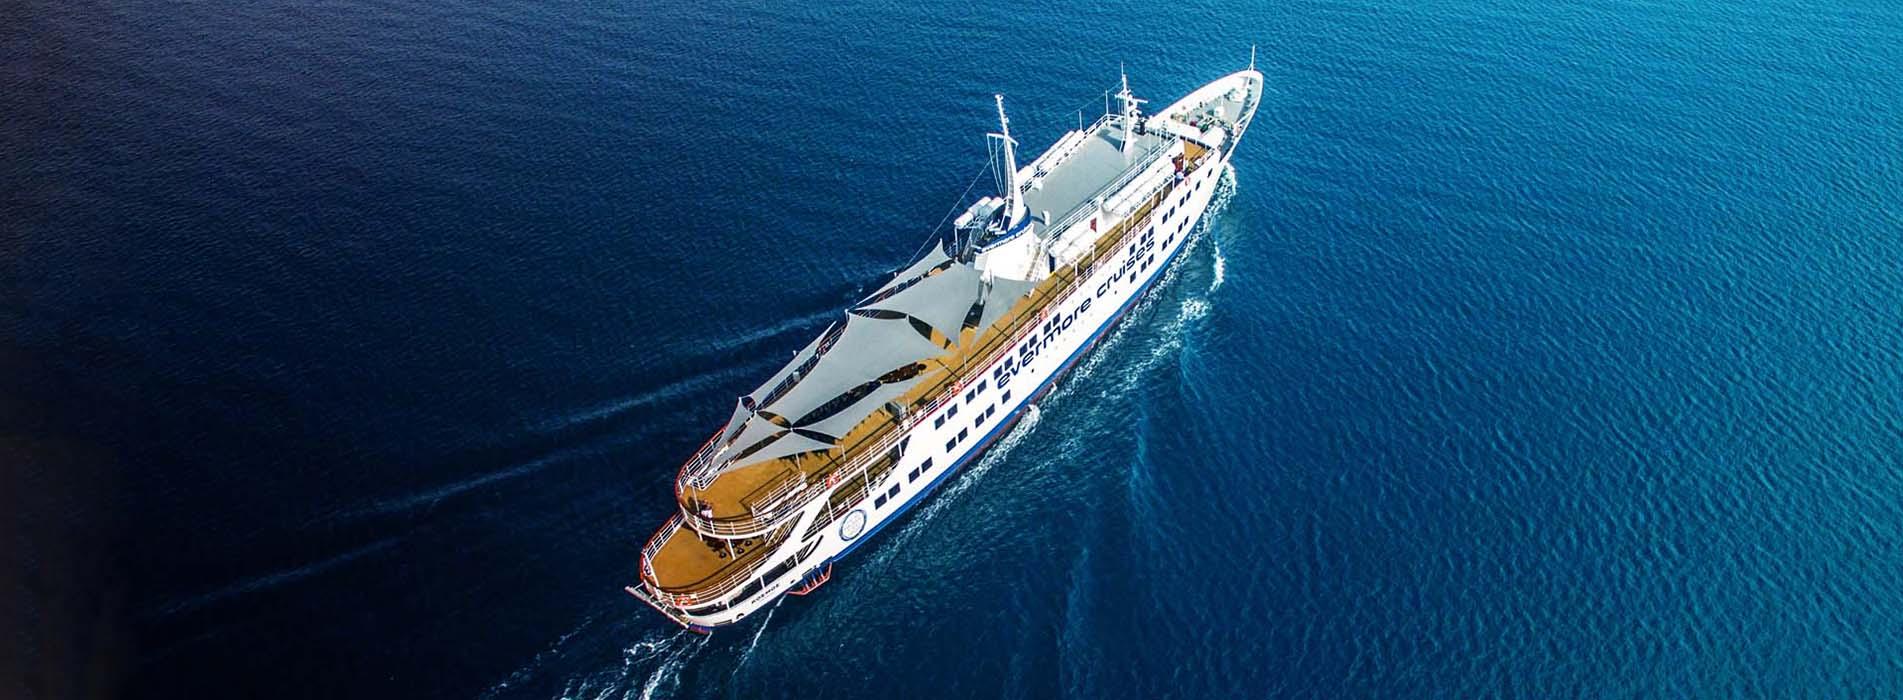 One Day Cruise - COSMOS ship 2 (main)